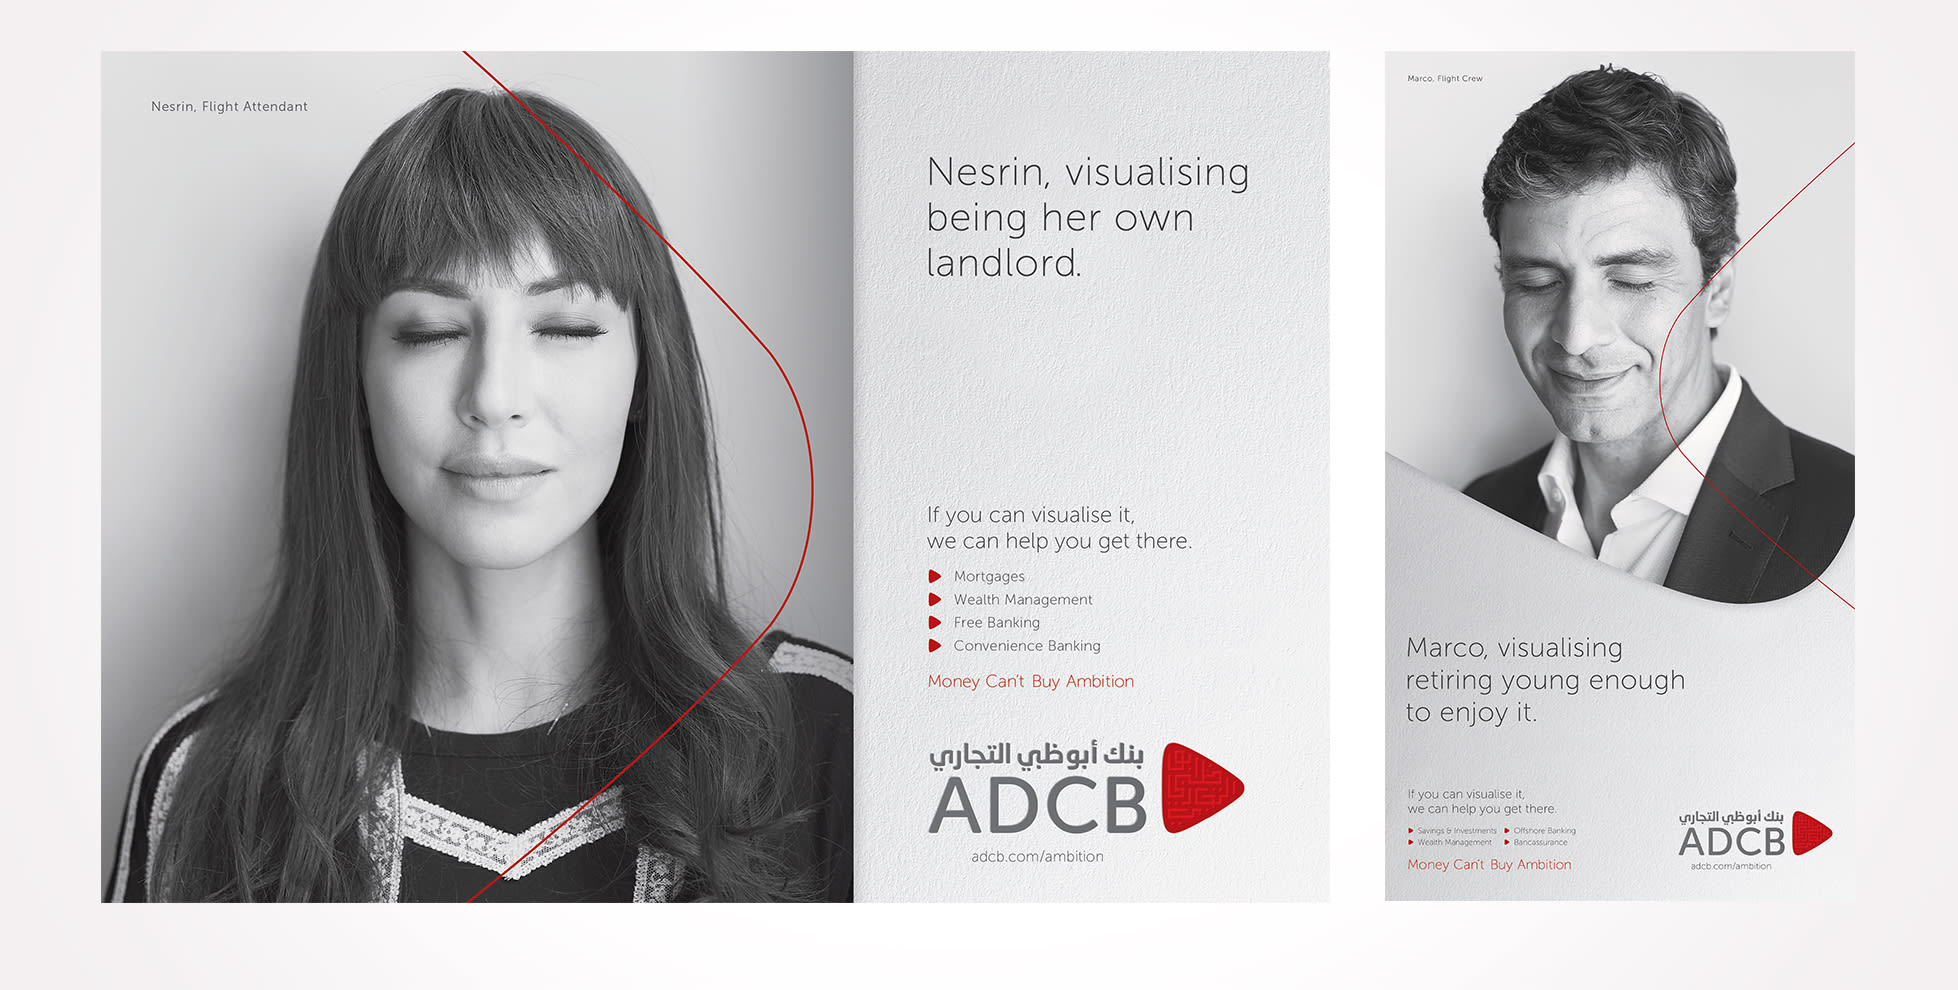 adcb_banner_design2